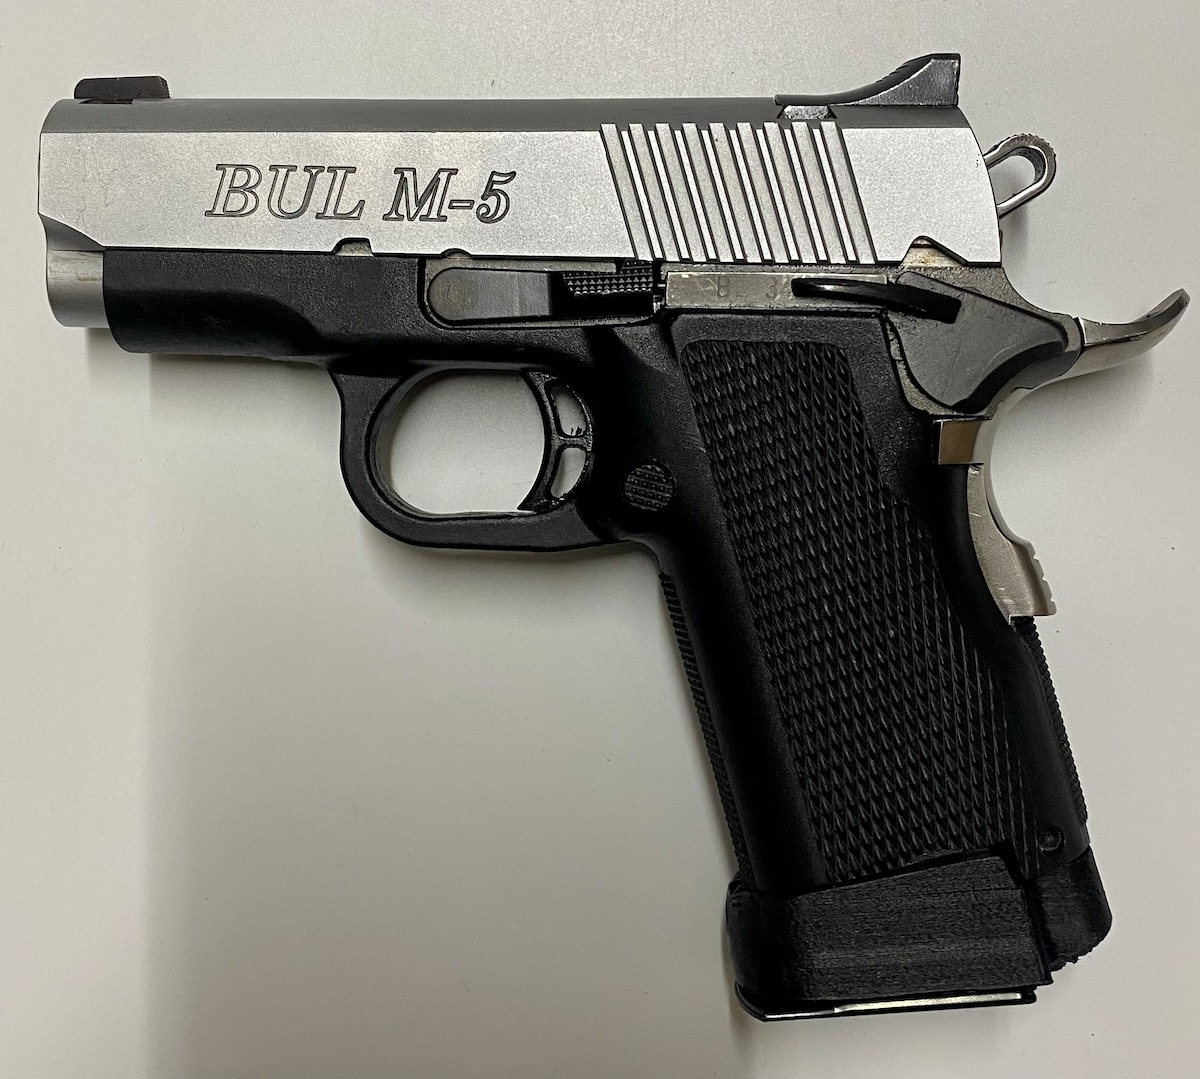 BUL ARMORY M-5